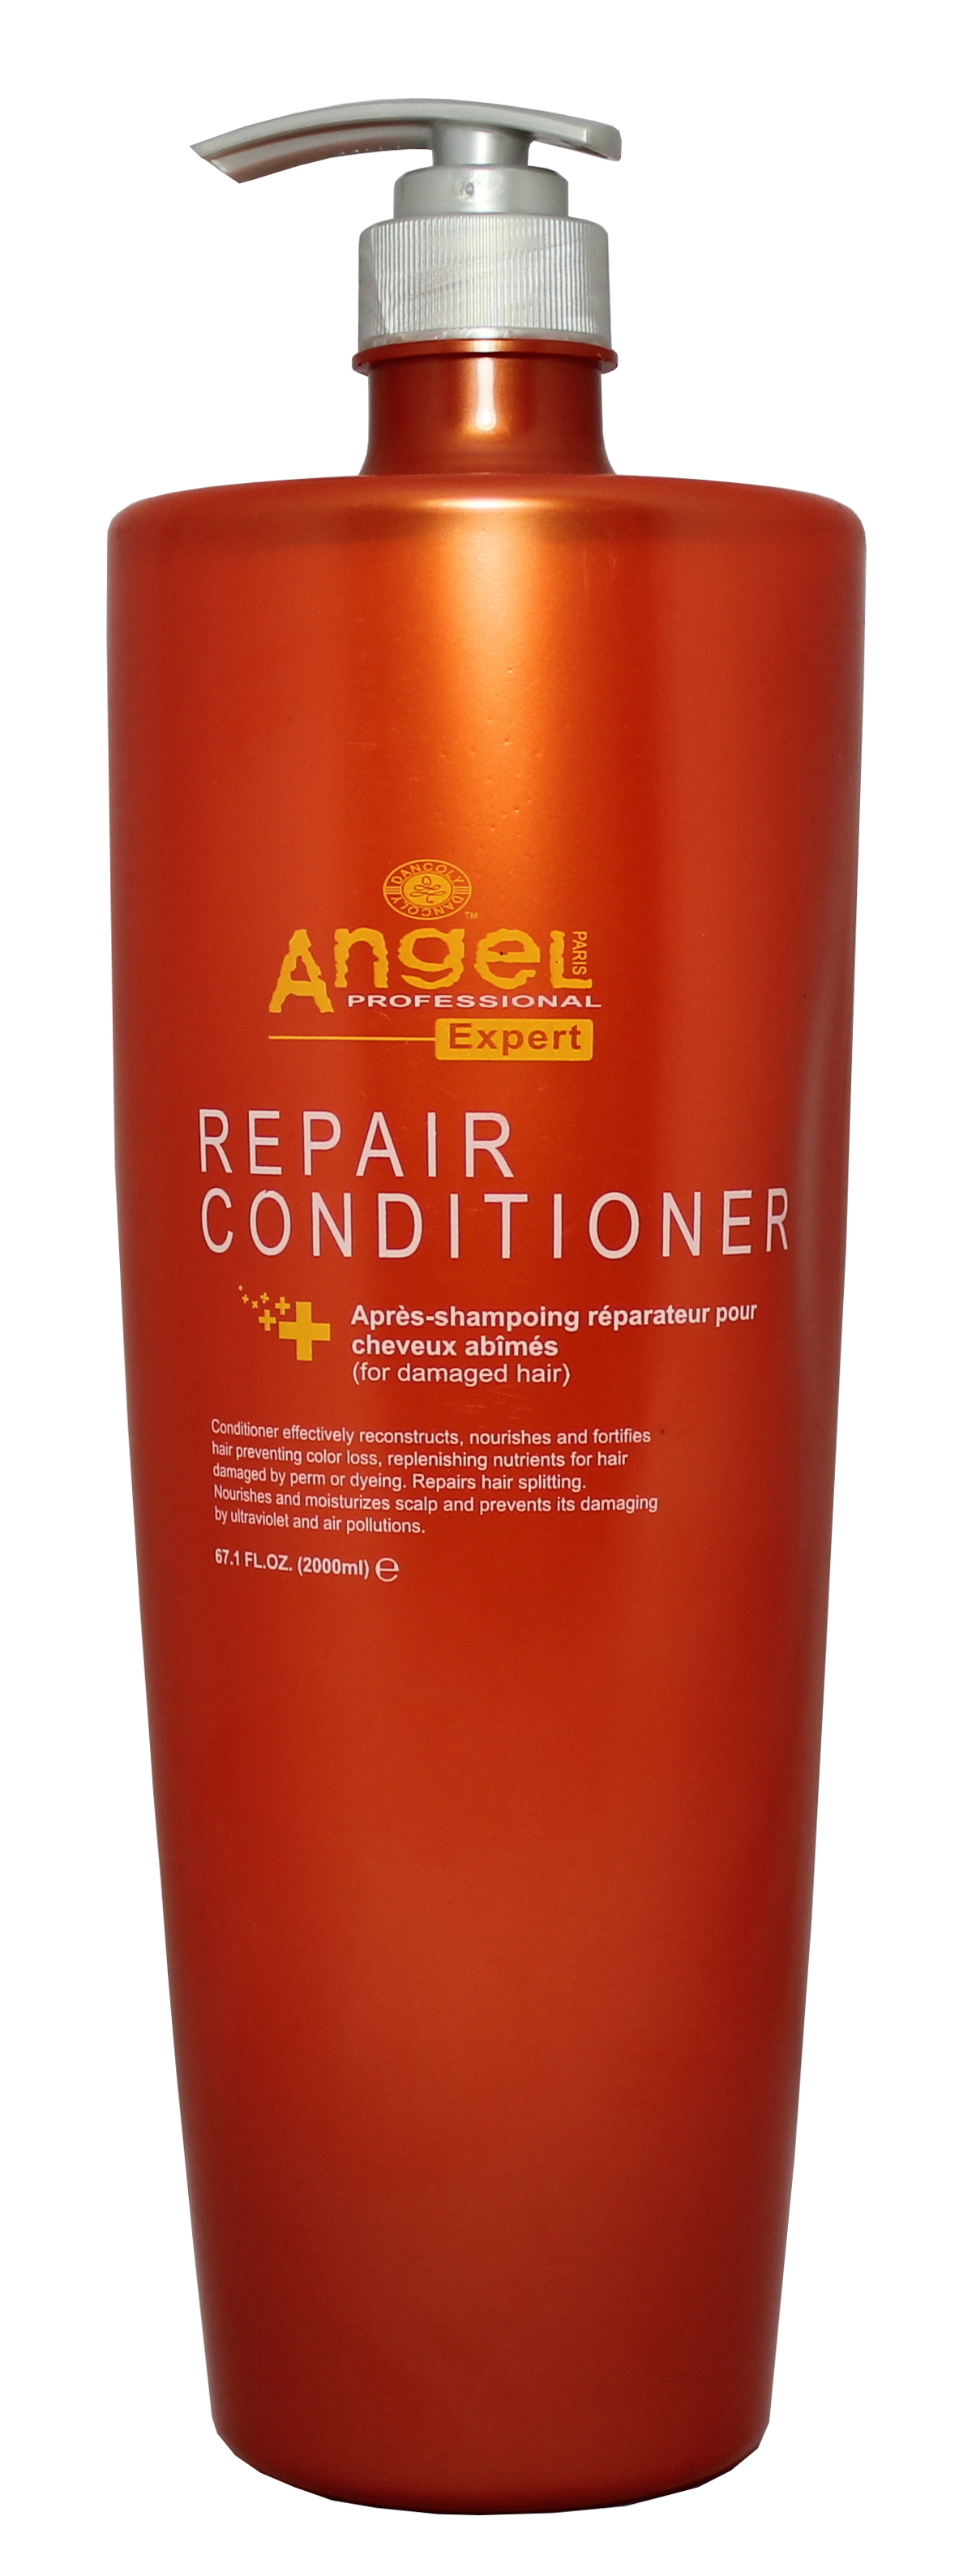 Atstatantis kondicionierius, pažeistiems plaukams Angel Professional Expert Repair Conditioner 2000 ml-0